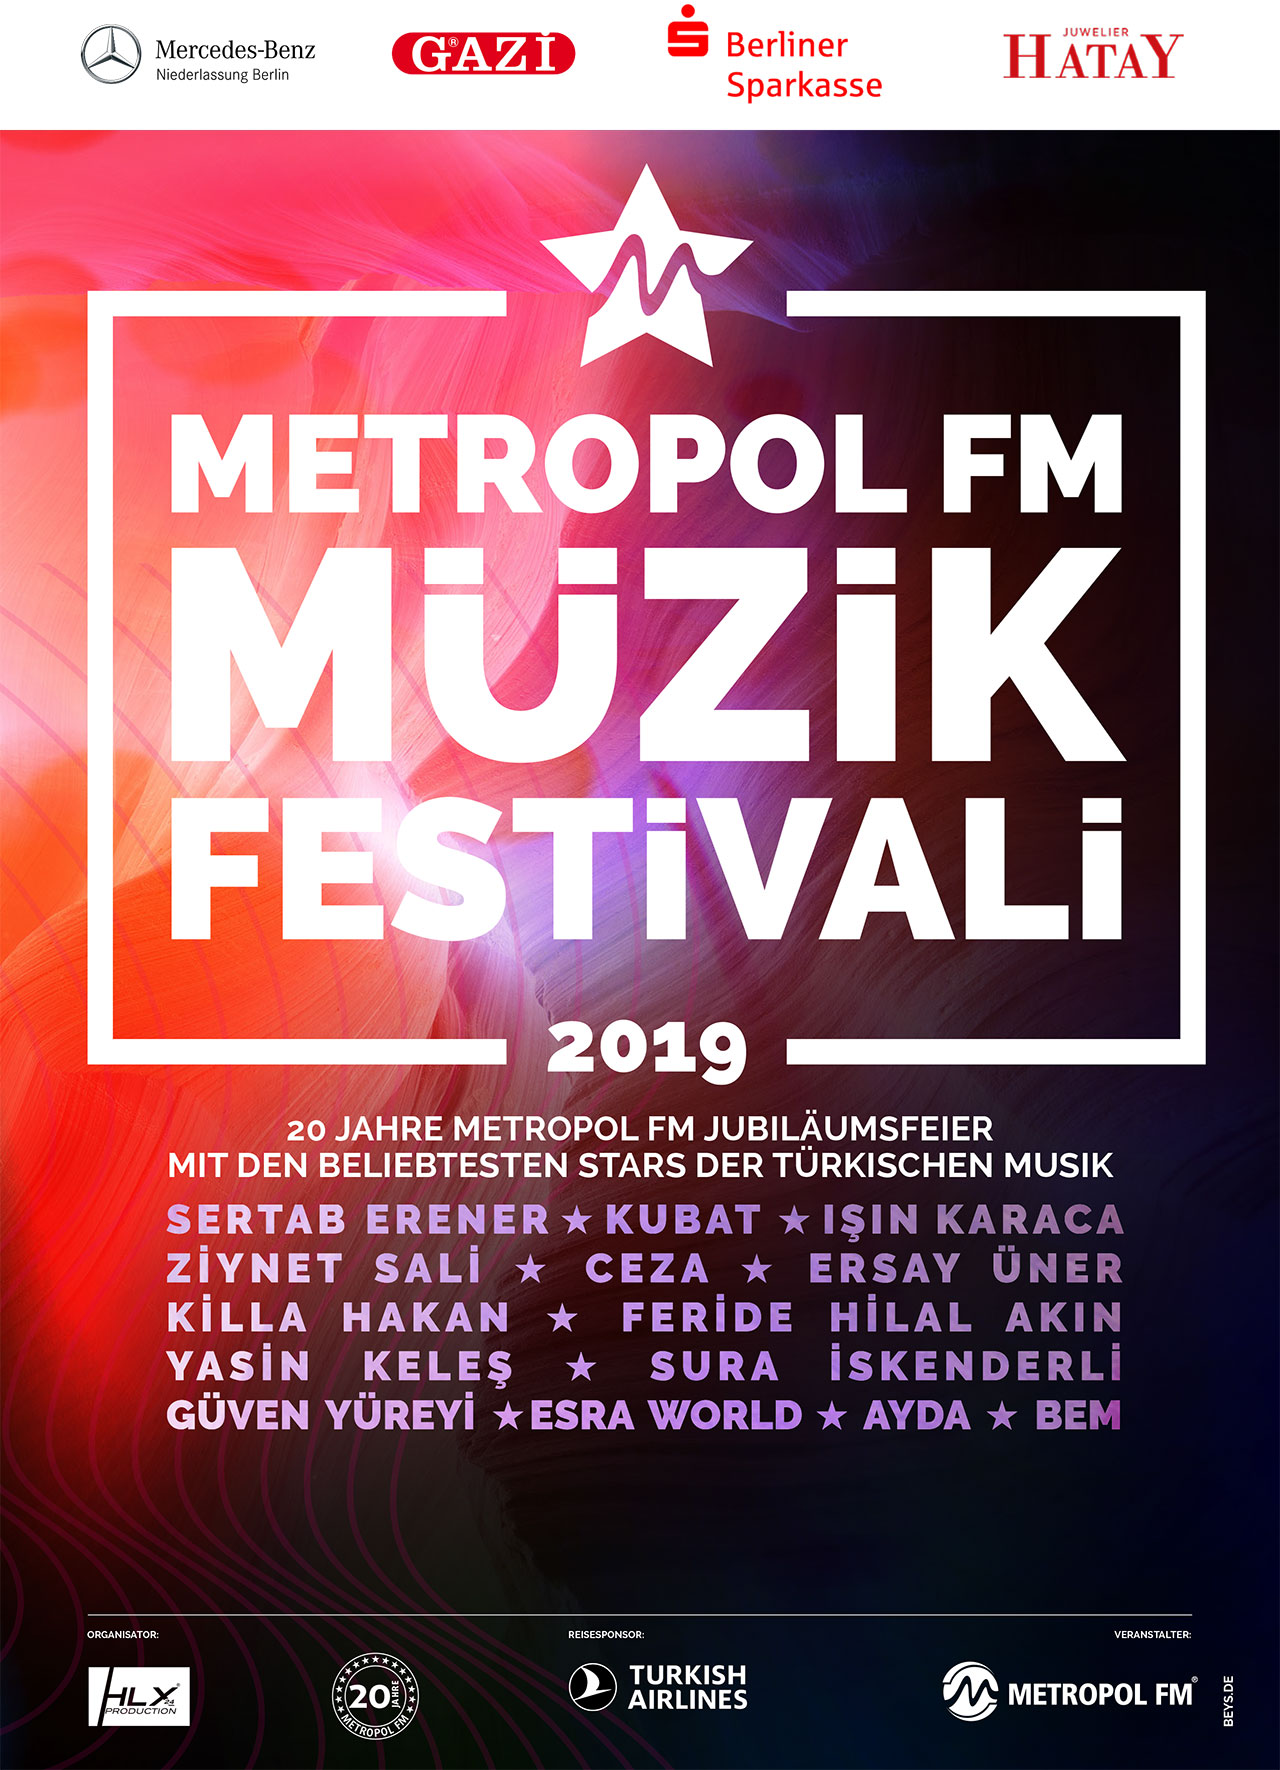 MFM Müzik Festivali